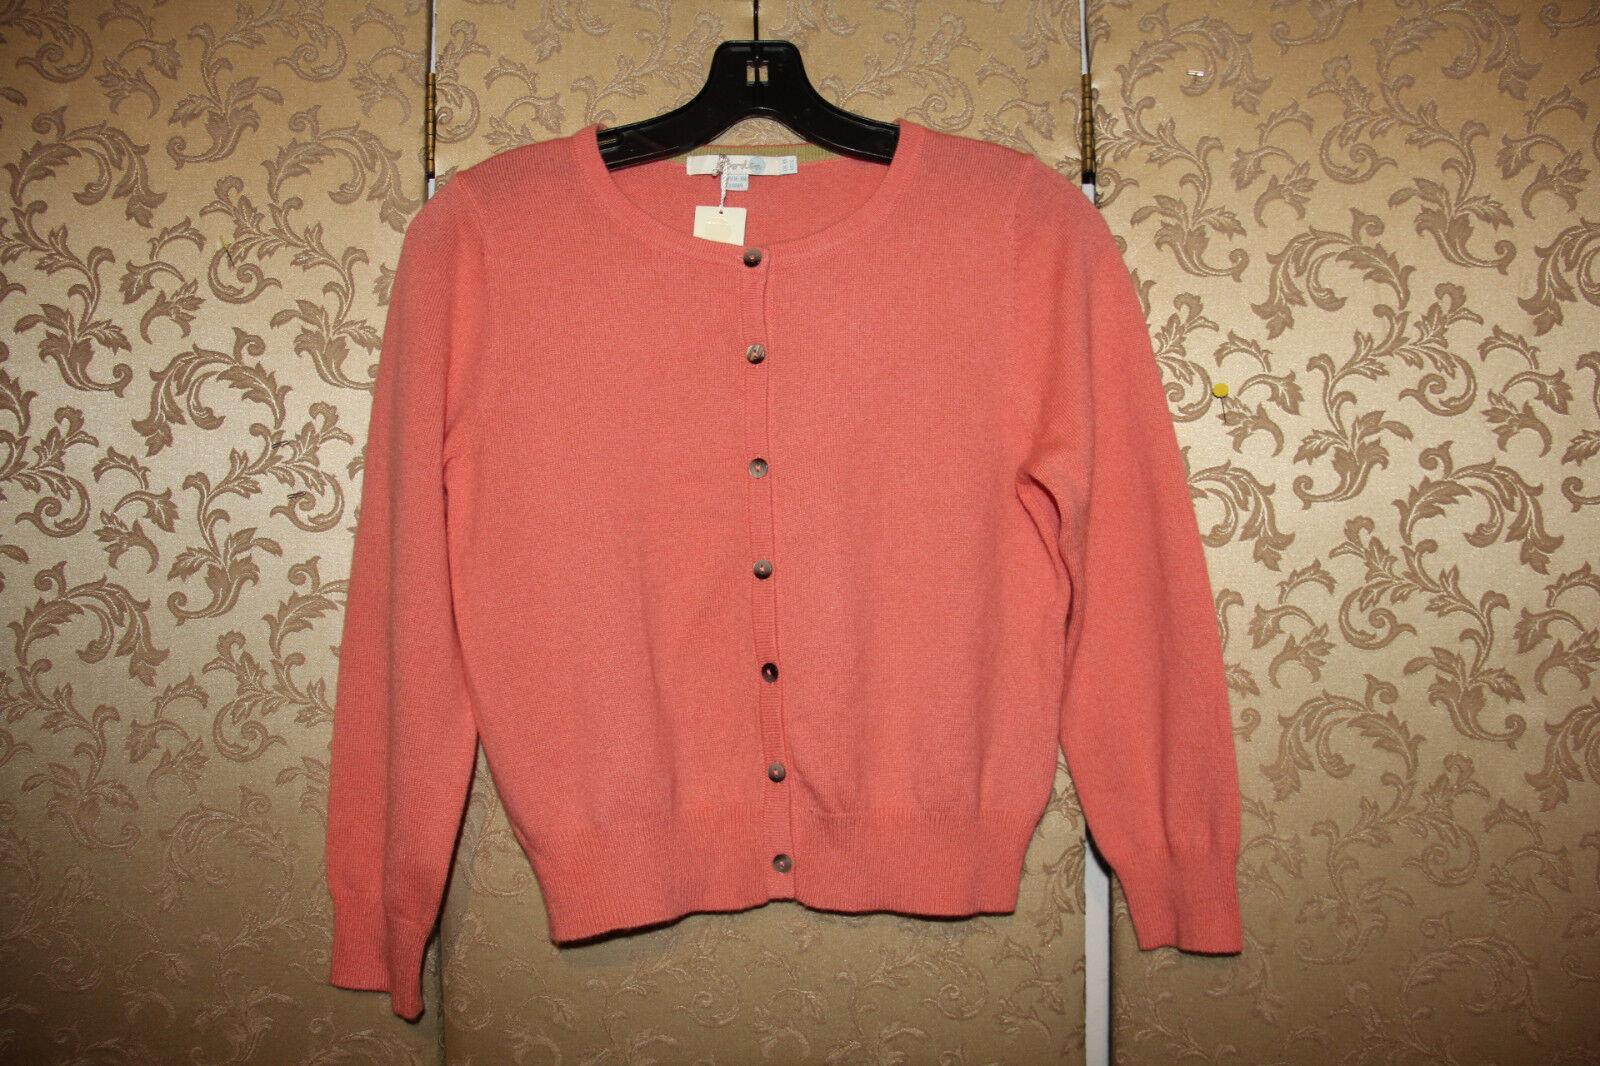 Boden NWT Peach orange 100% Cashmere Cropped Spring Cardigan Sweater 6